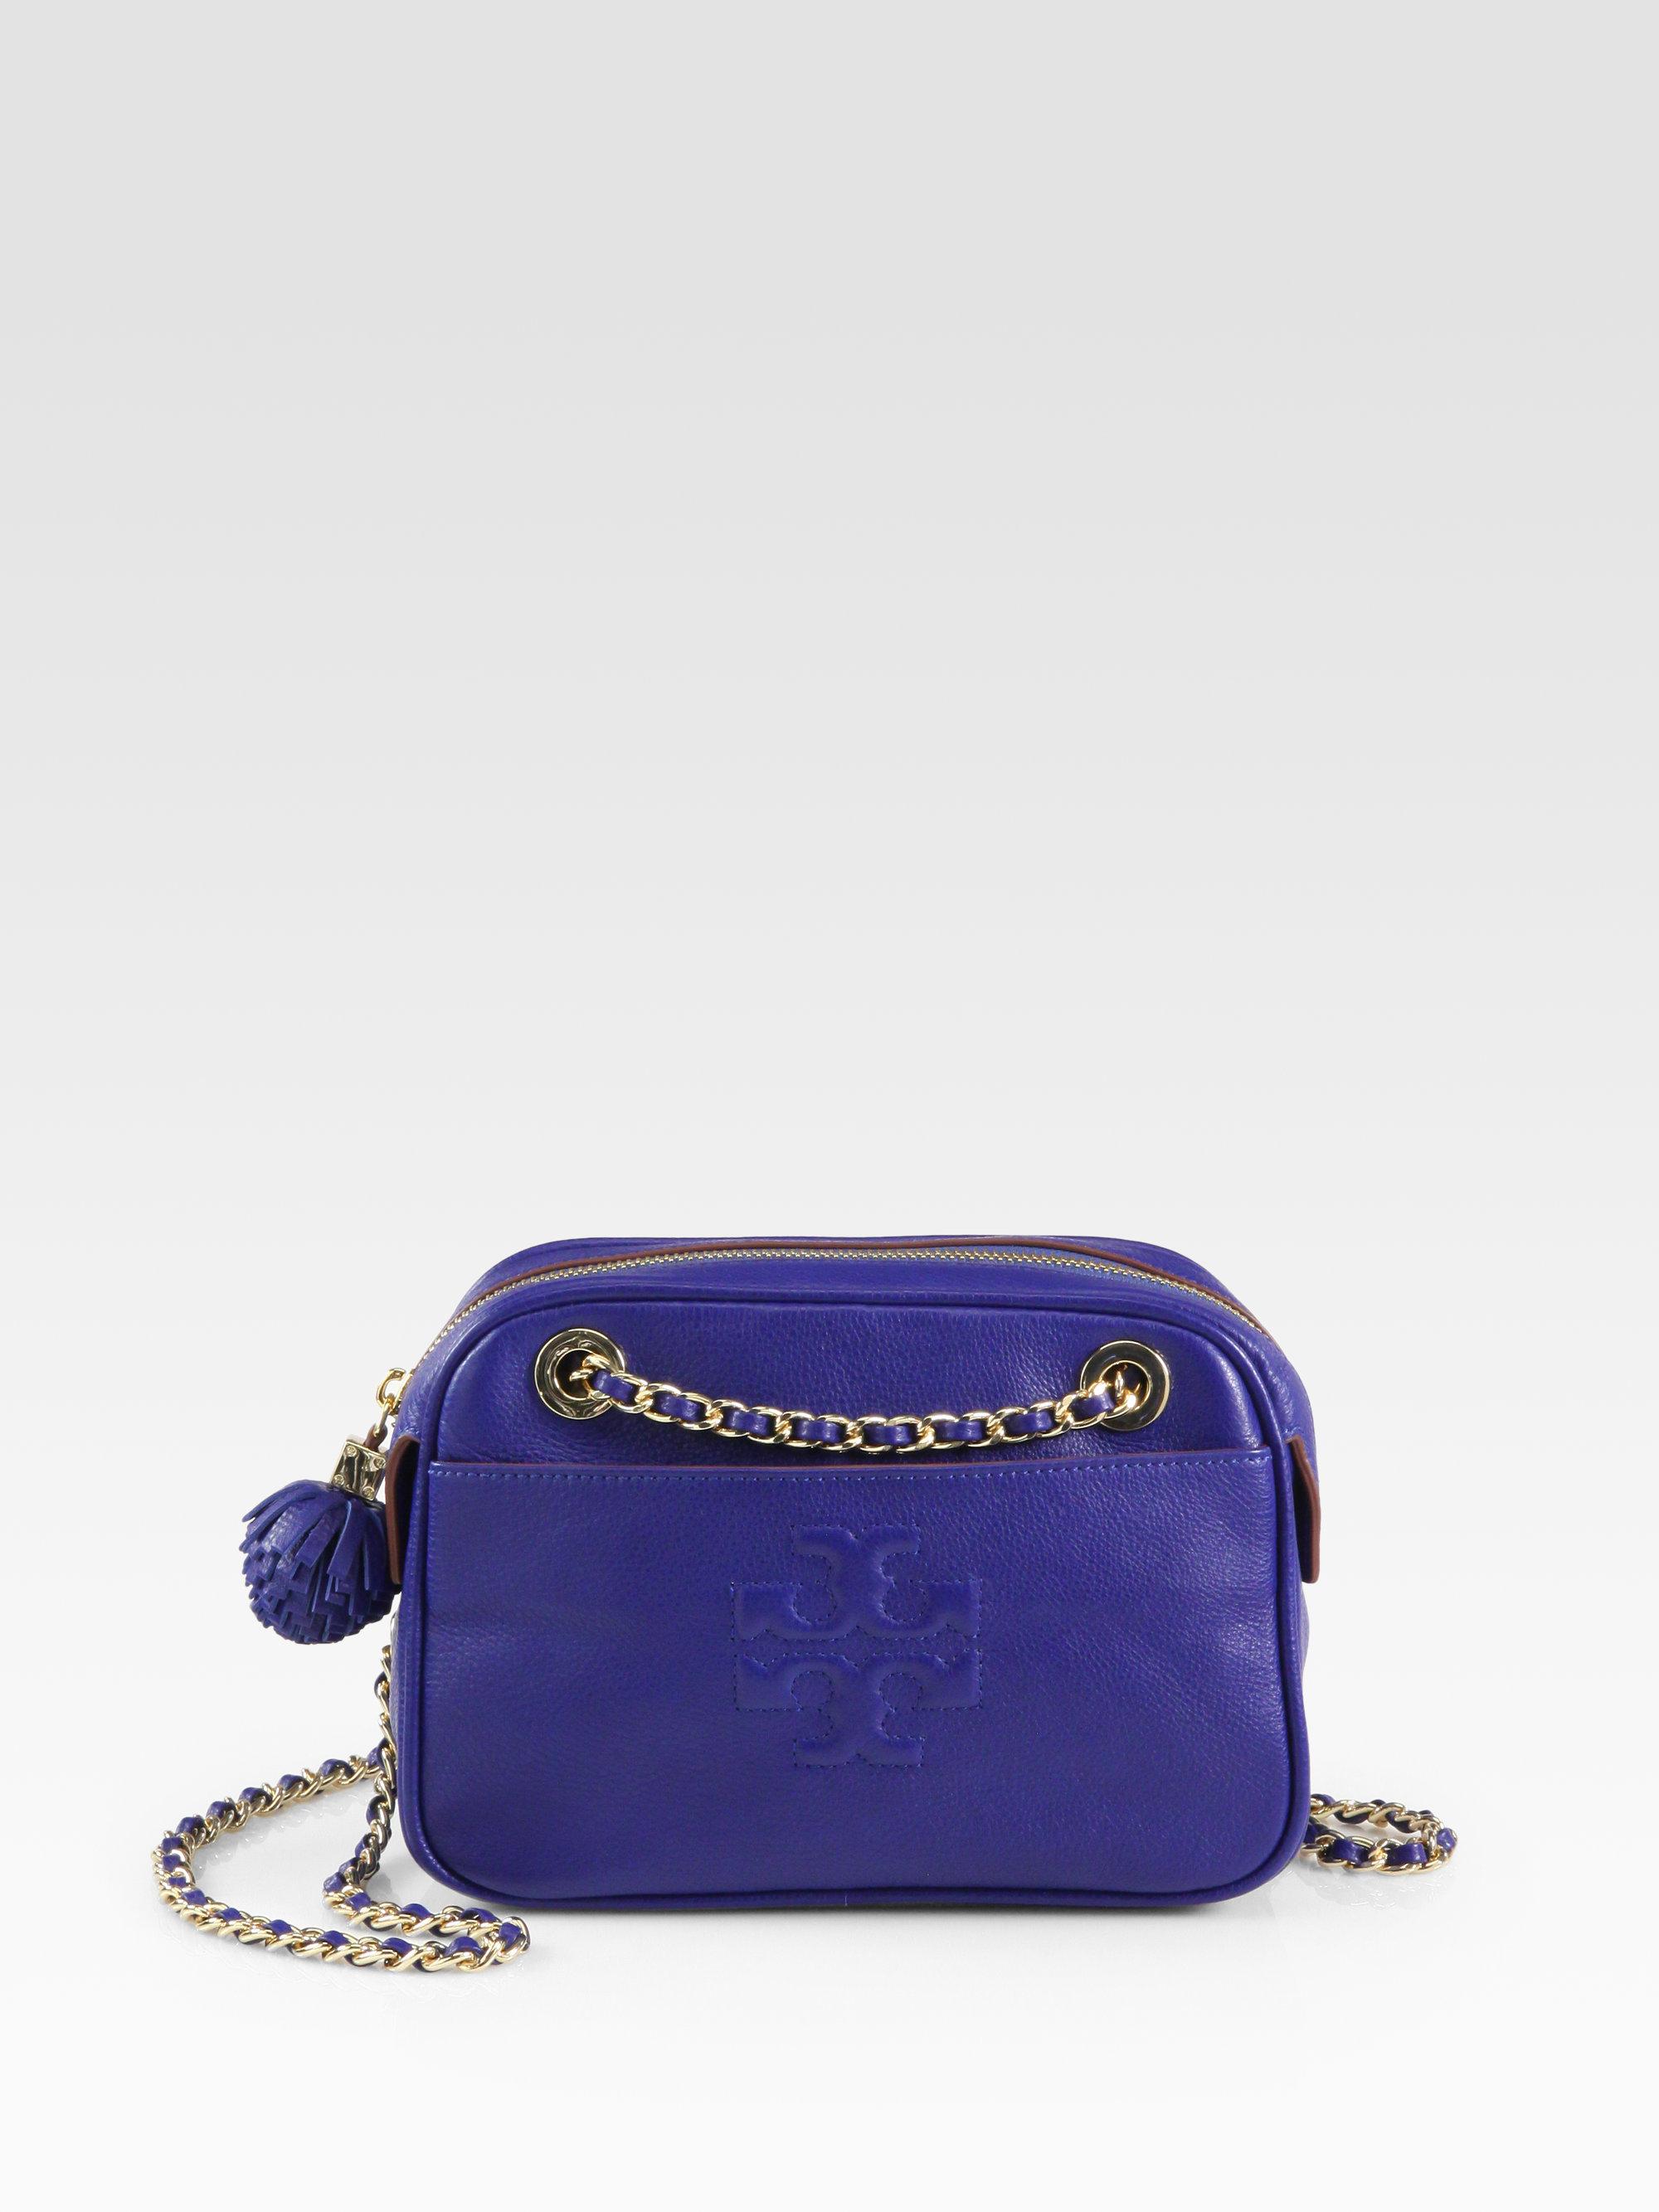 8f18aa7c9f Tory Burch Thea Crossbody Chain Bag in Blue - Lyst